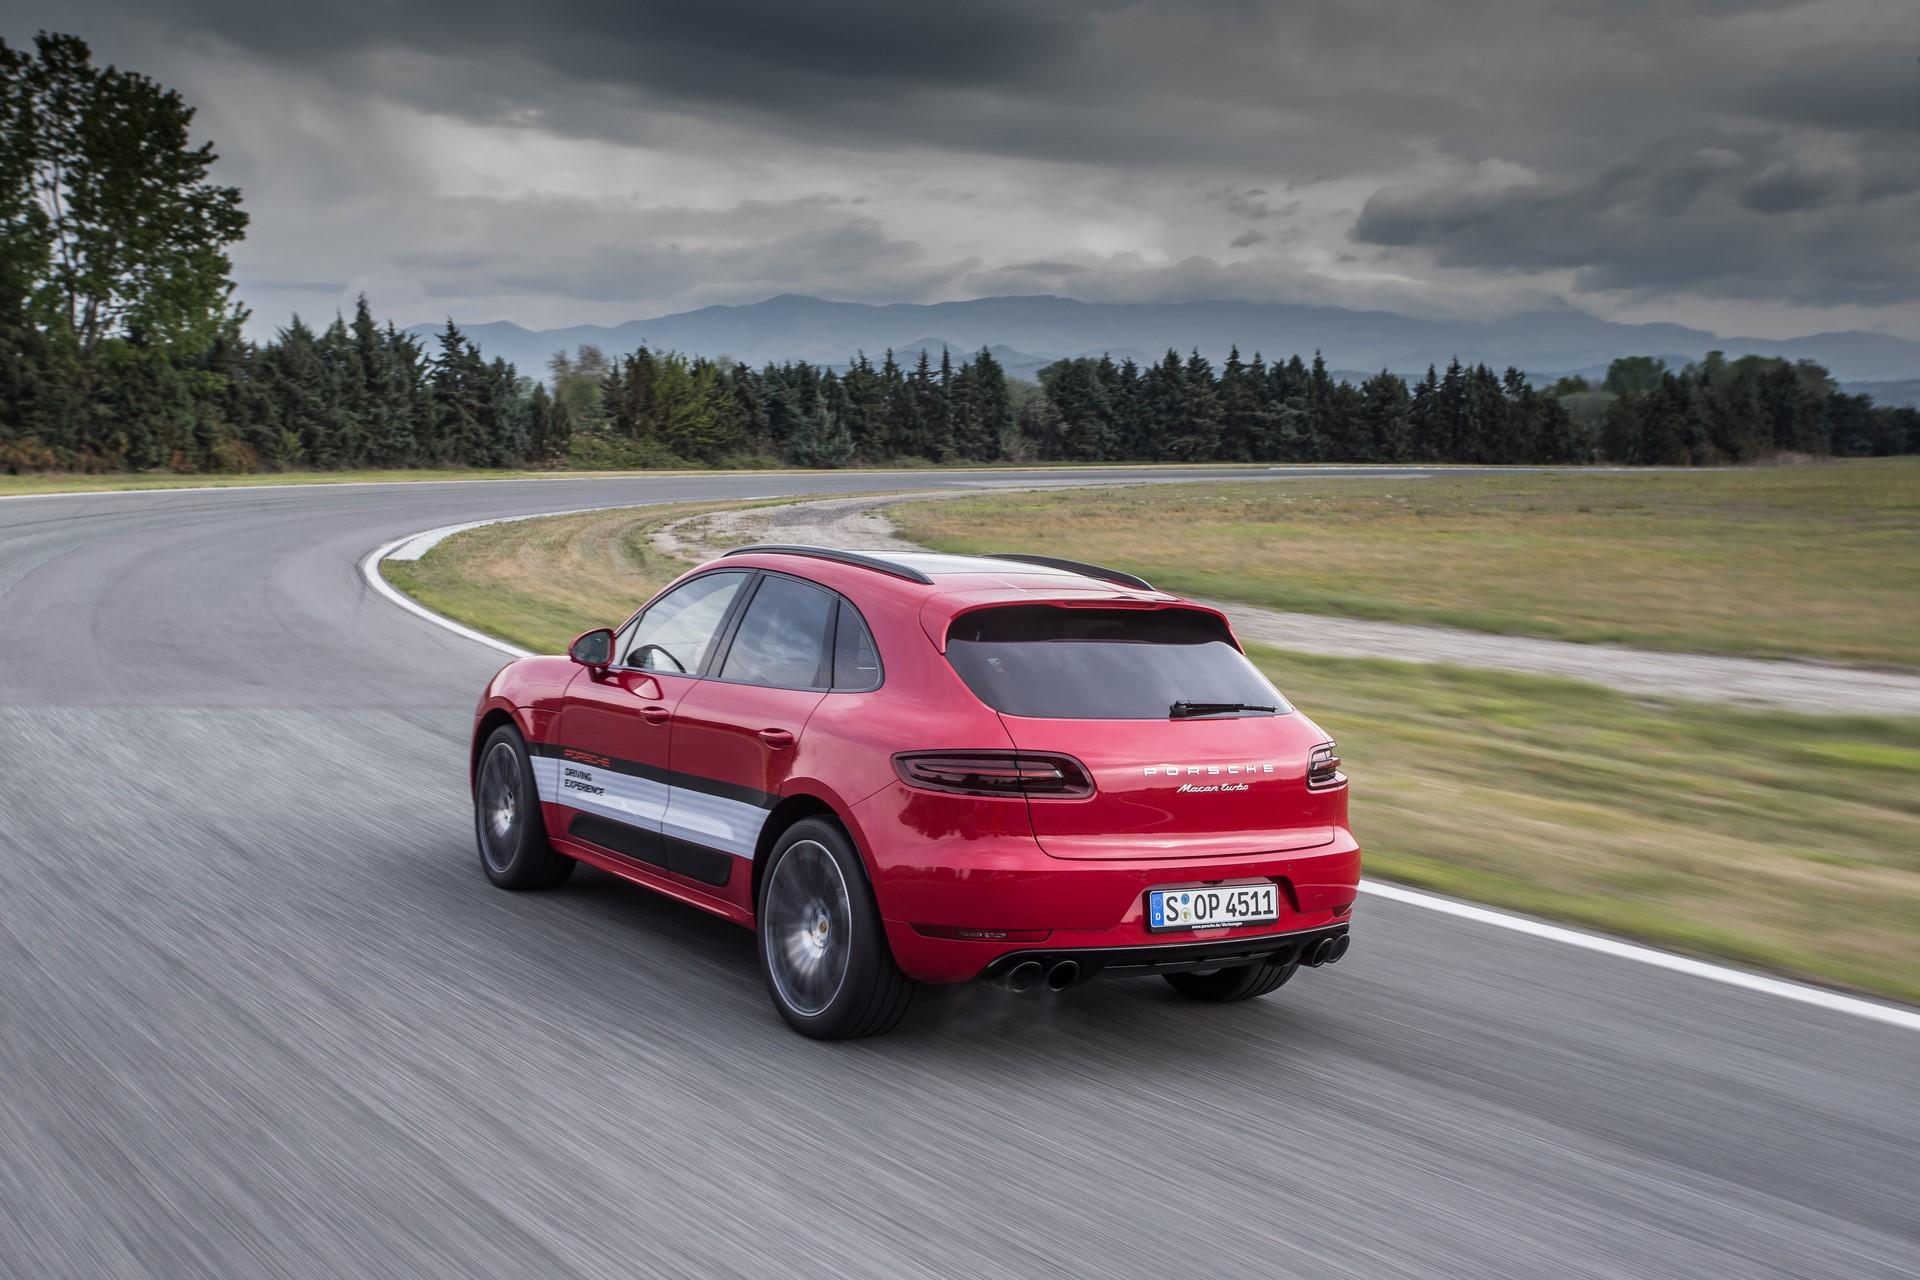 Porsche Driving Experience 2017 Serres (61)